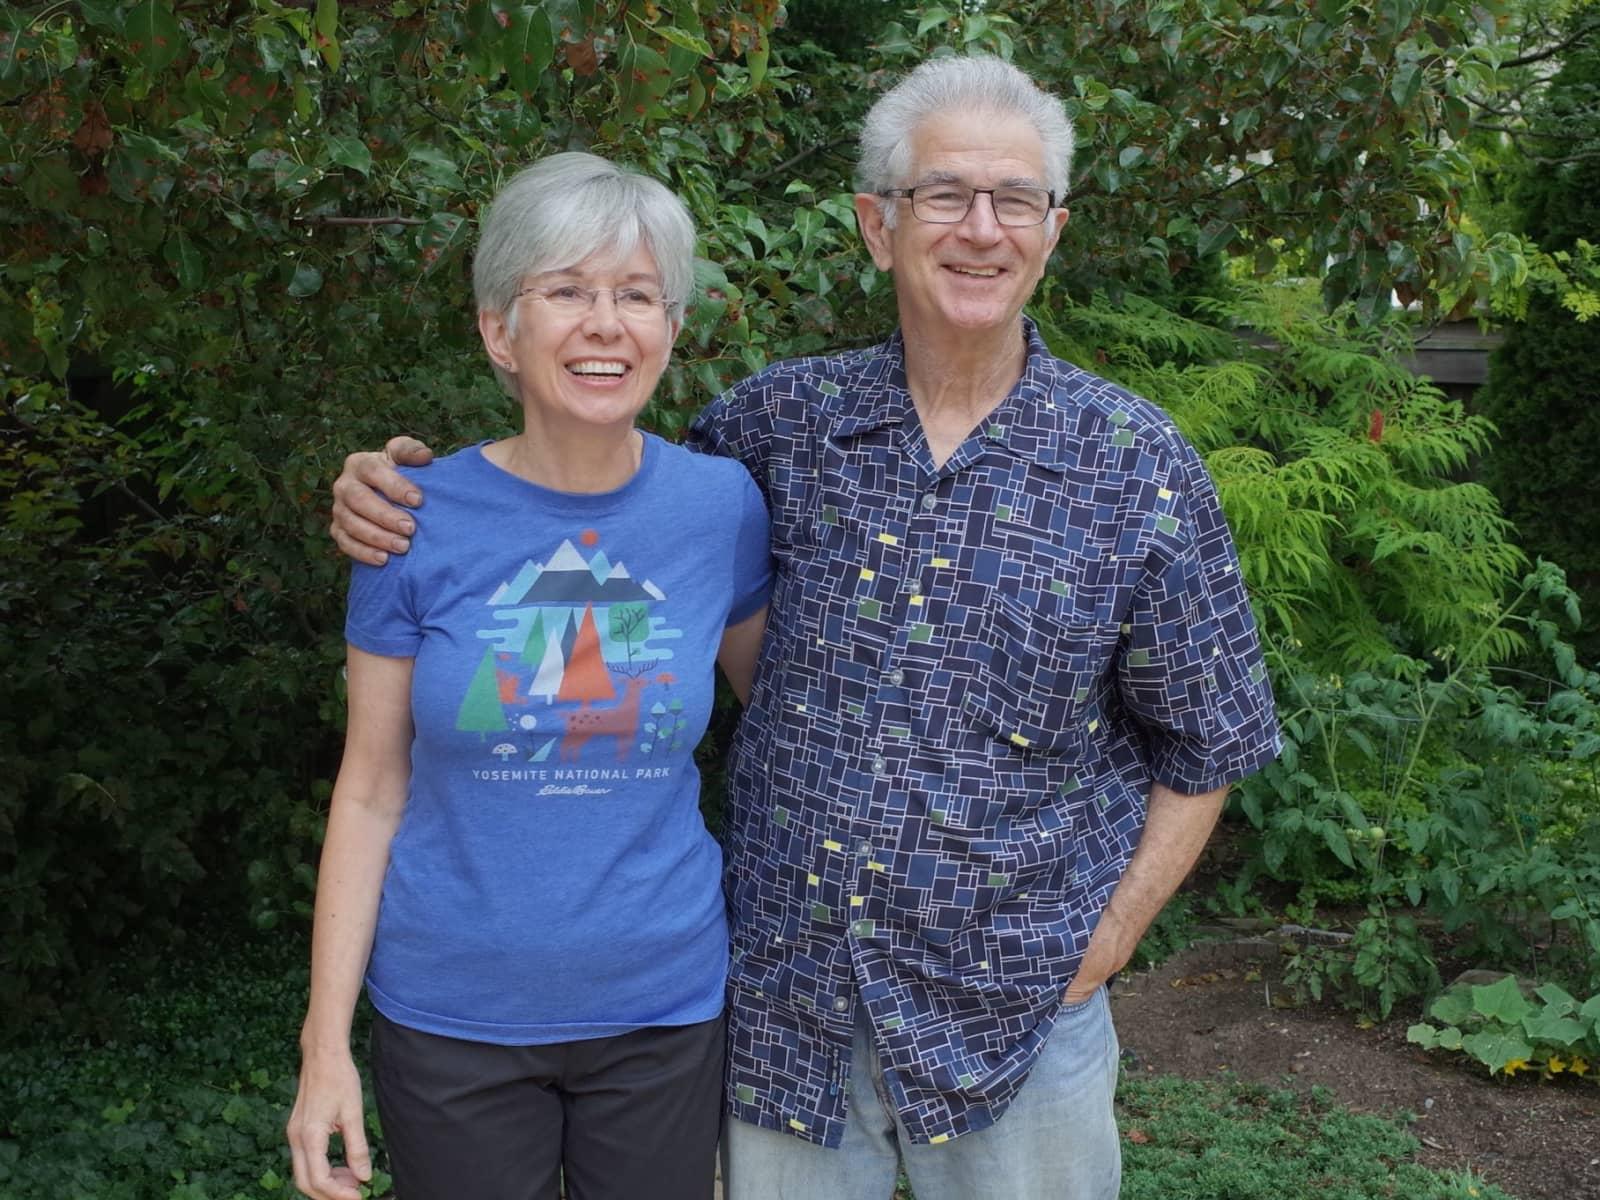 Irma & Michael from Oshawa, Ontario, Canada